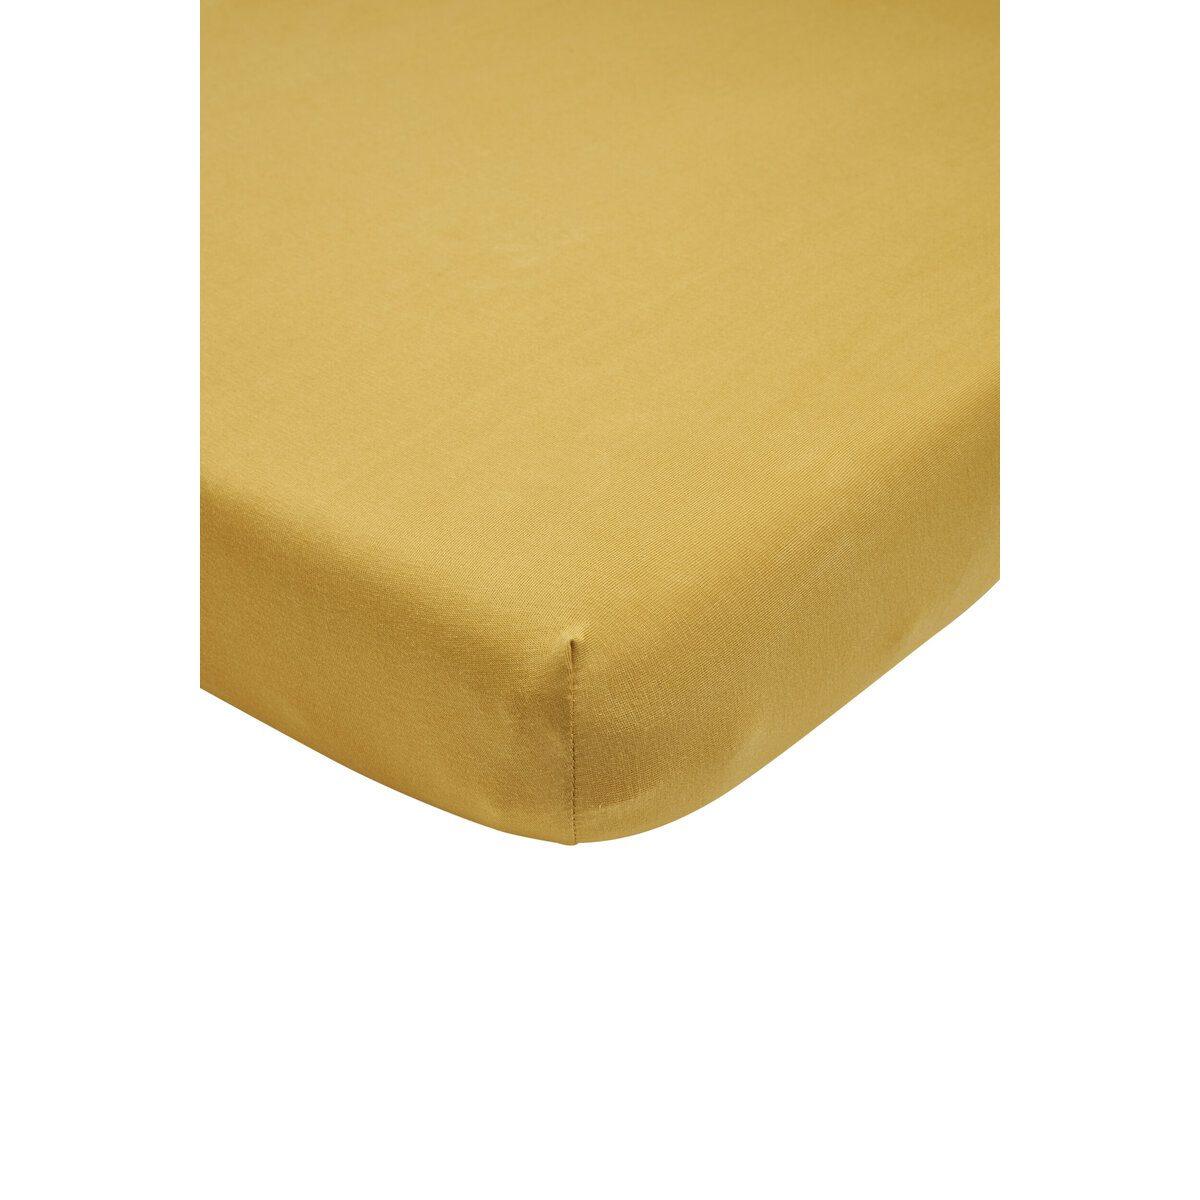 Meyco Jersey Hoeslaken Boxmatras 75x95 cm. 75x95 - Honey Gold